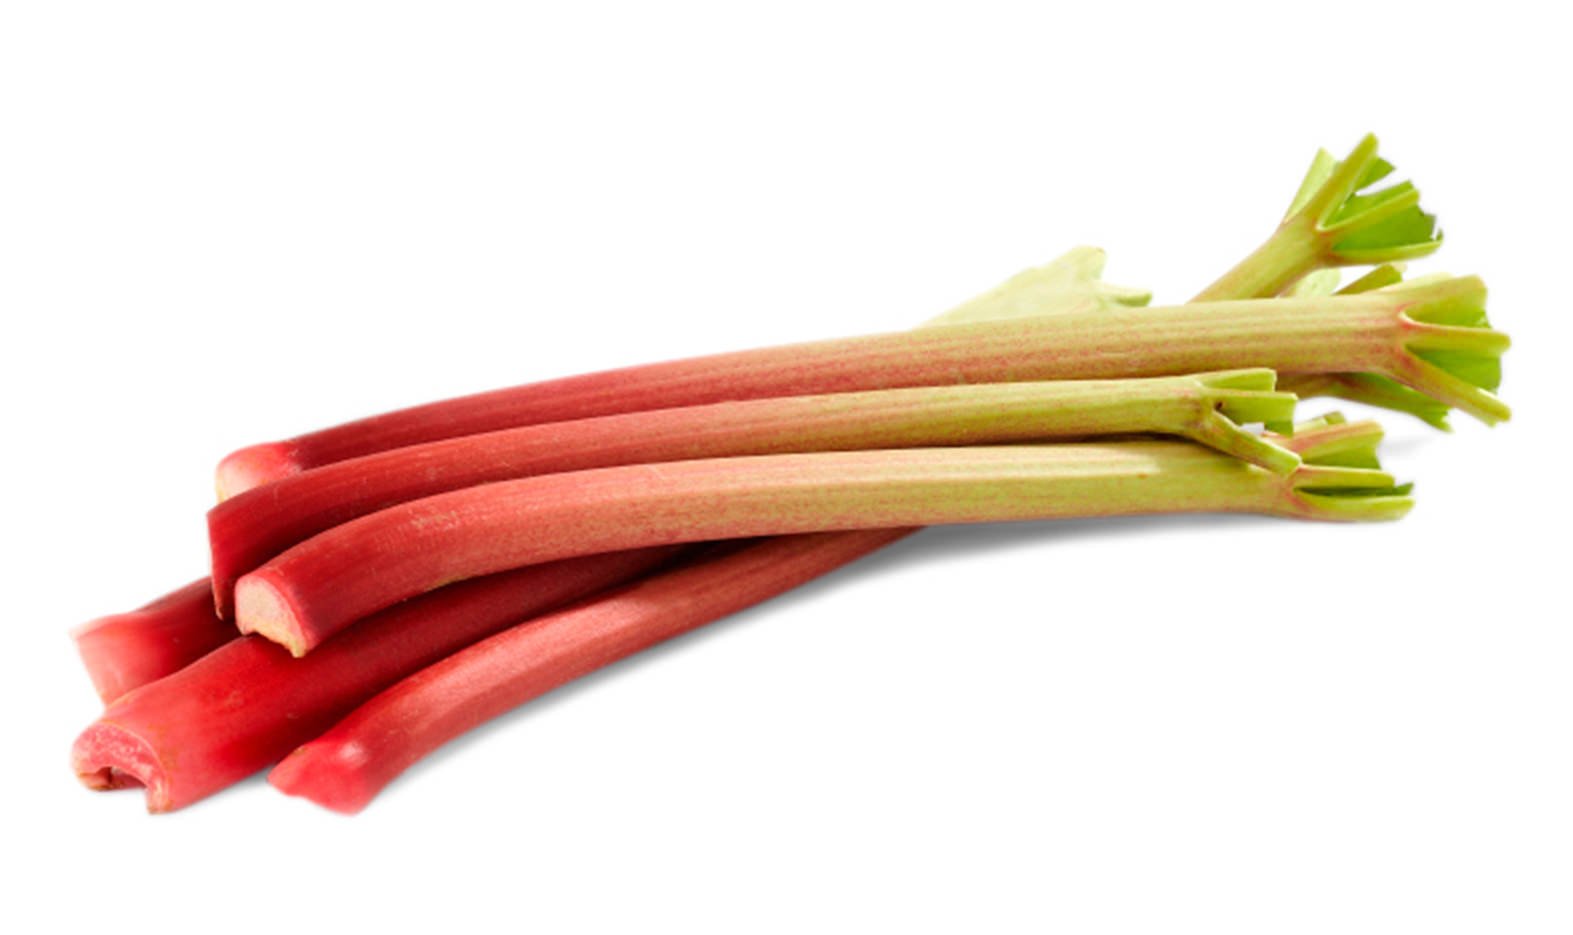 Rhubarb Image